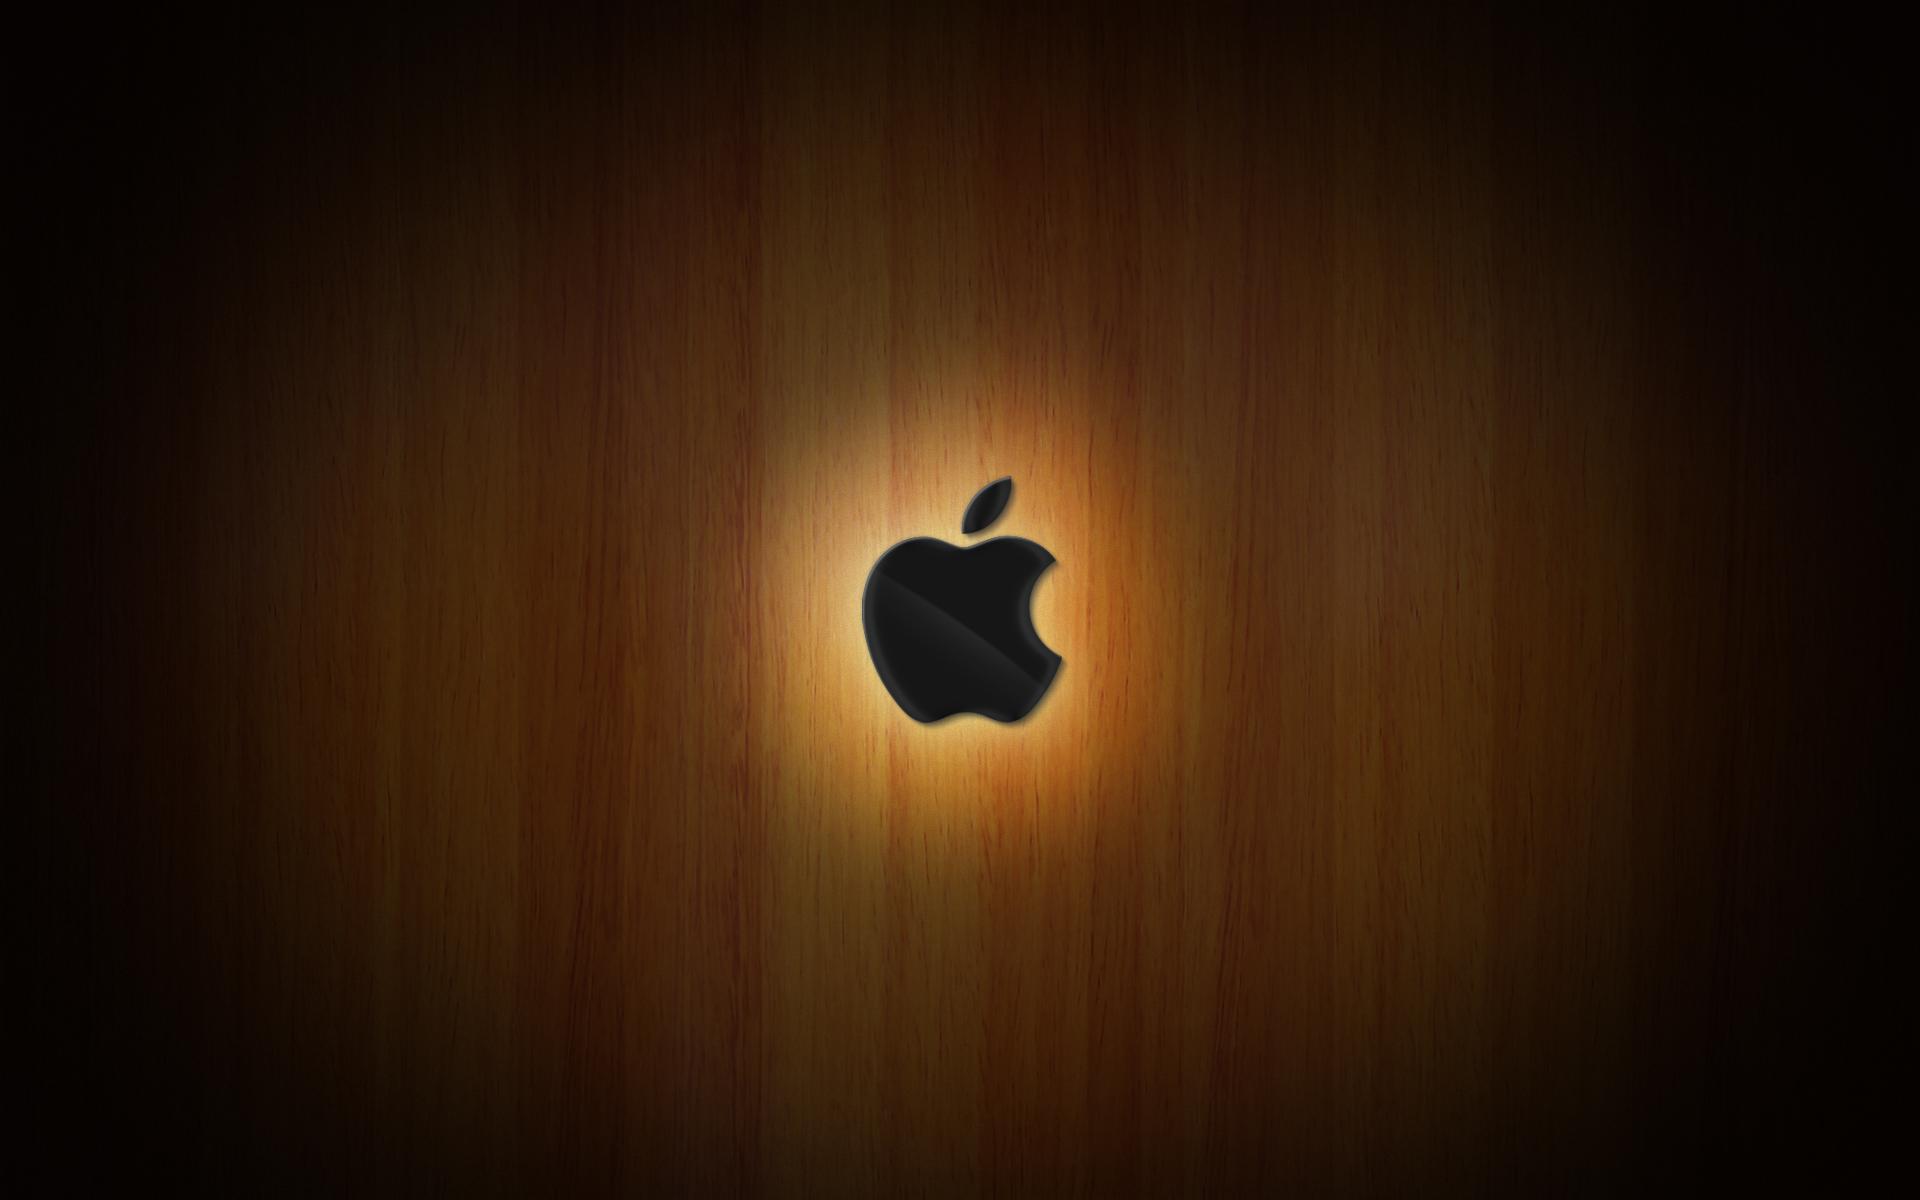 Apple Wood Wallpaper #27307 Wallpaper | High Resolution Wallarthd com